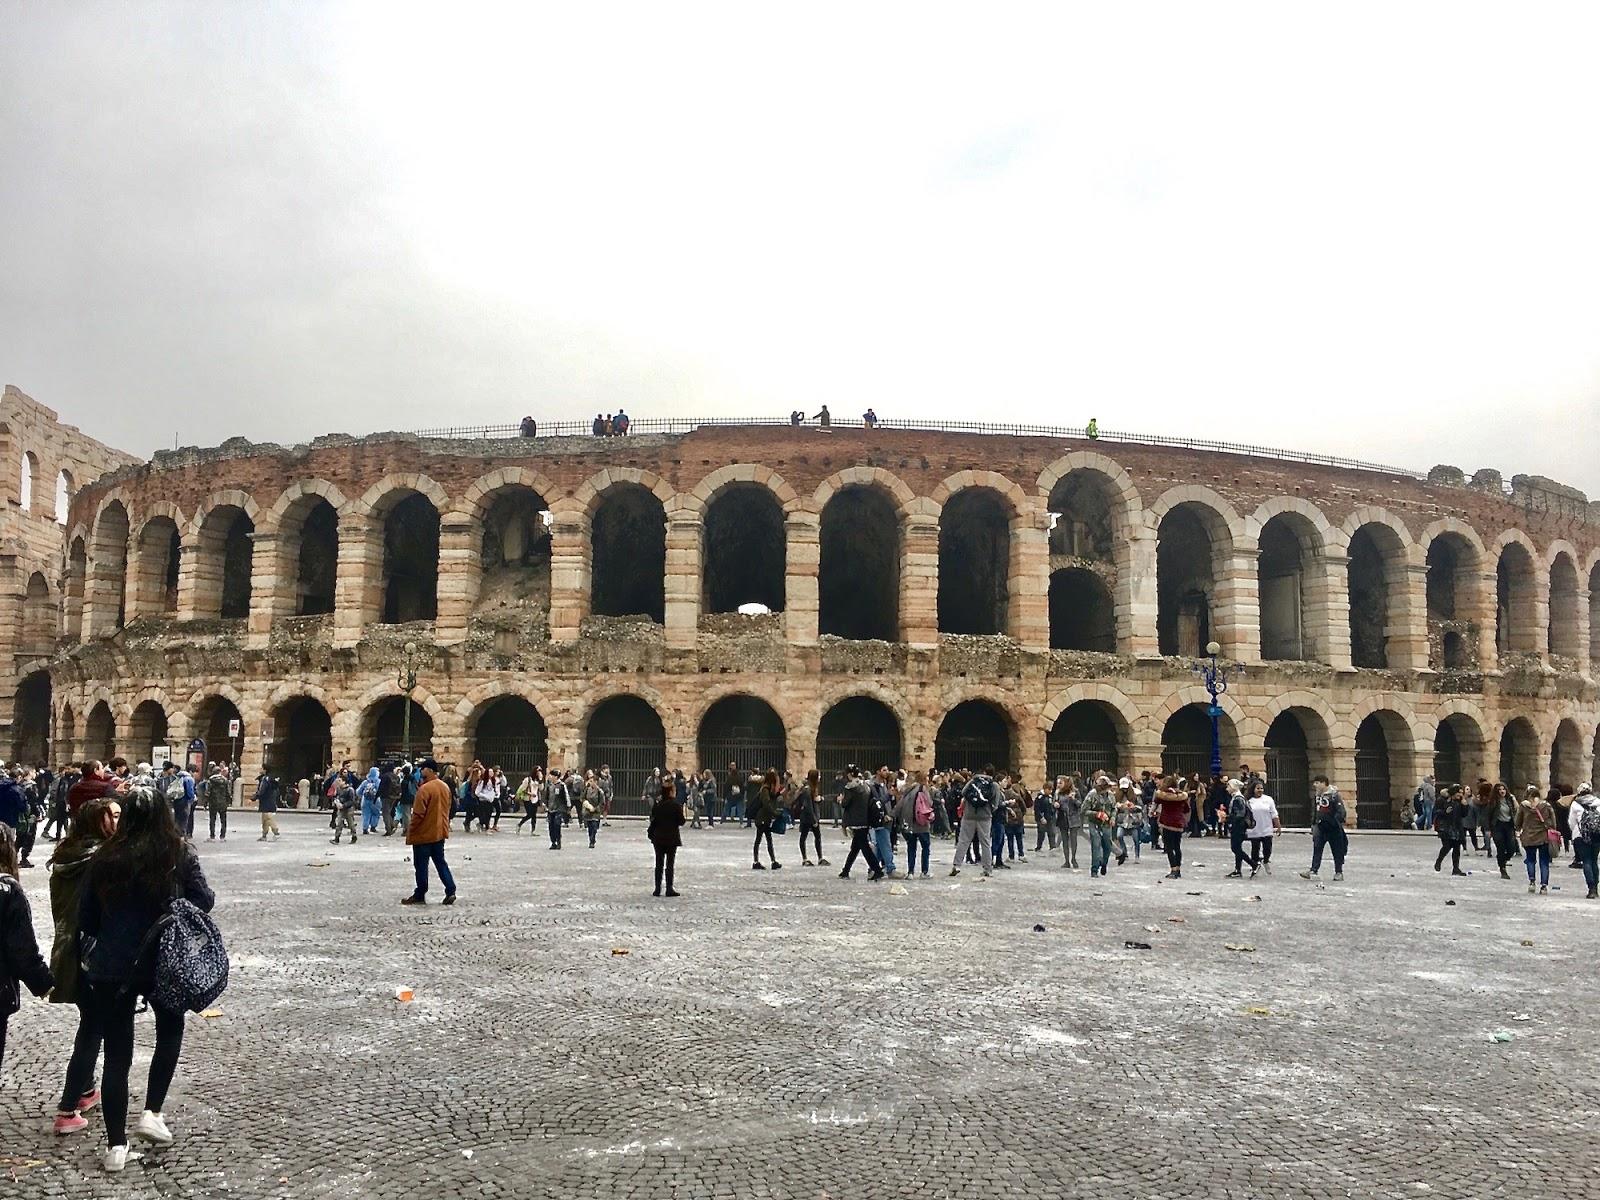 verona italy amphitheatre peexo travel blog